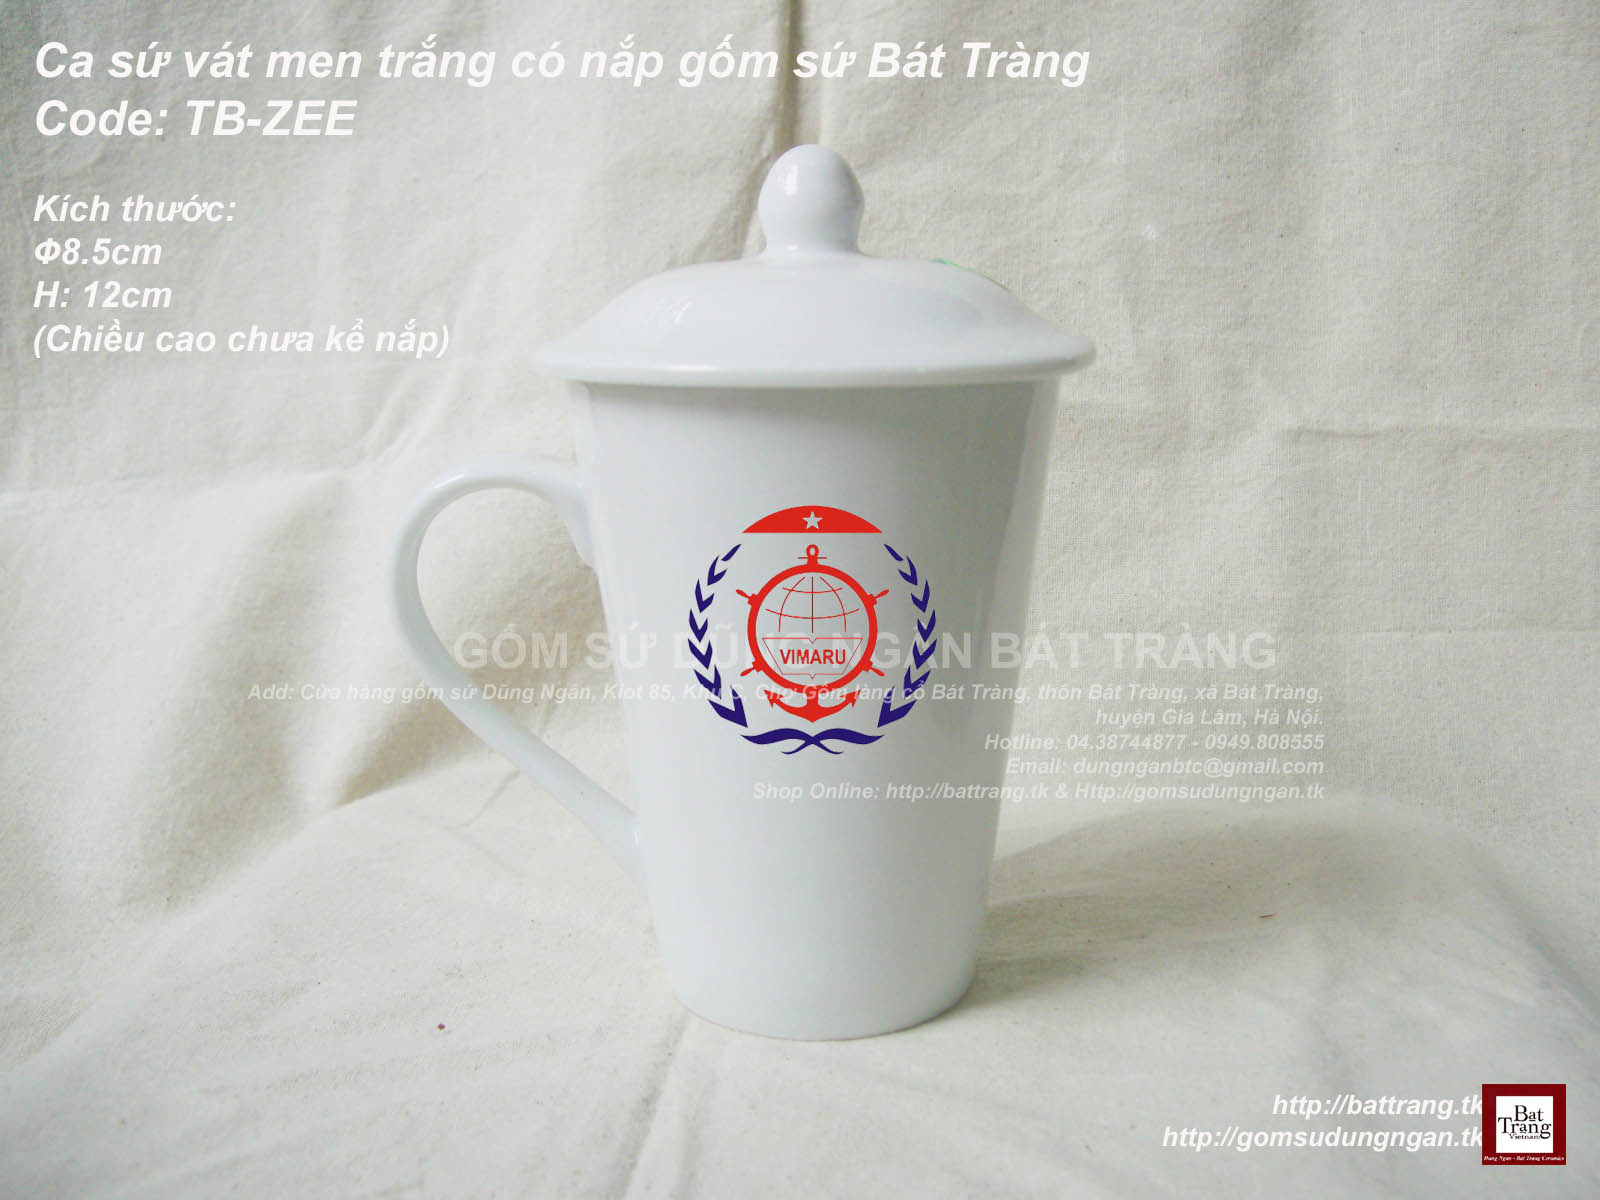 trang+co+nap+in+logo+Qua+tang+Hoi+nghi+Hoi+thao+Cong+ty+TNHH+Bat+Trang